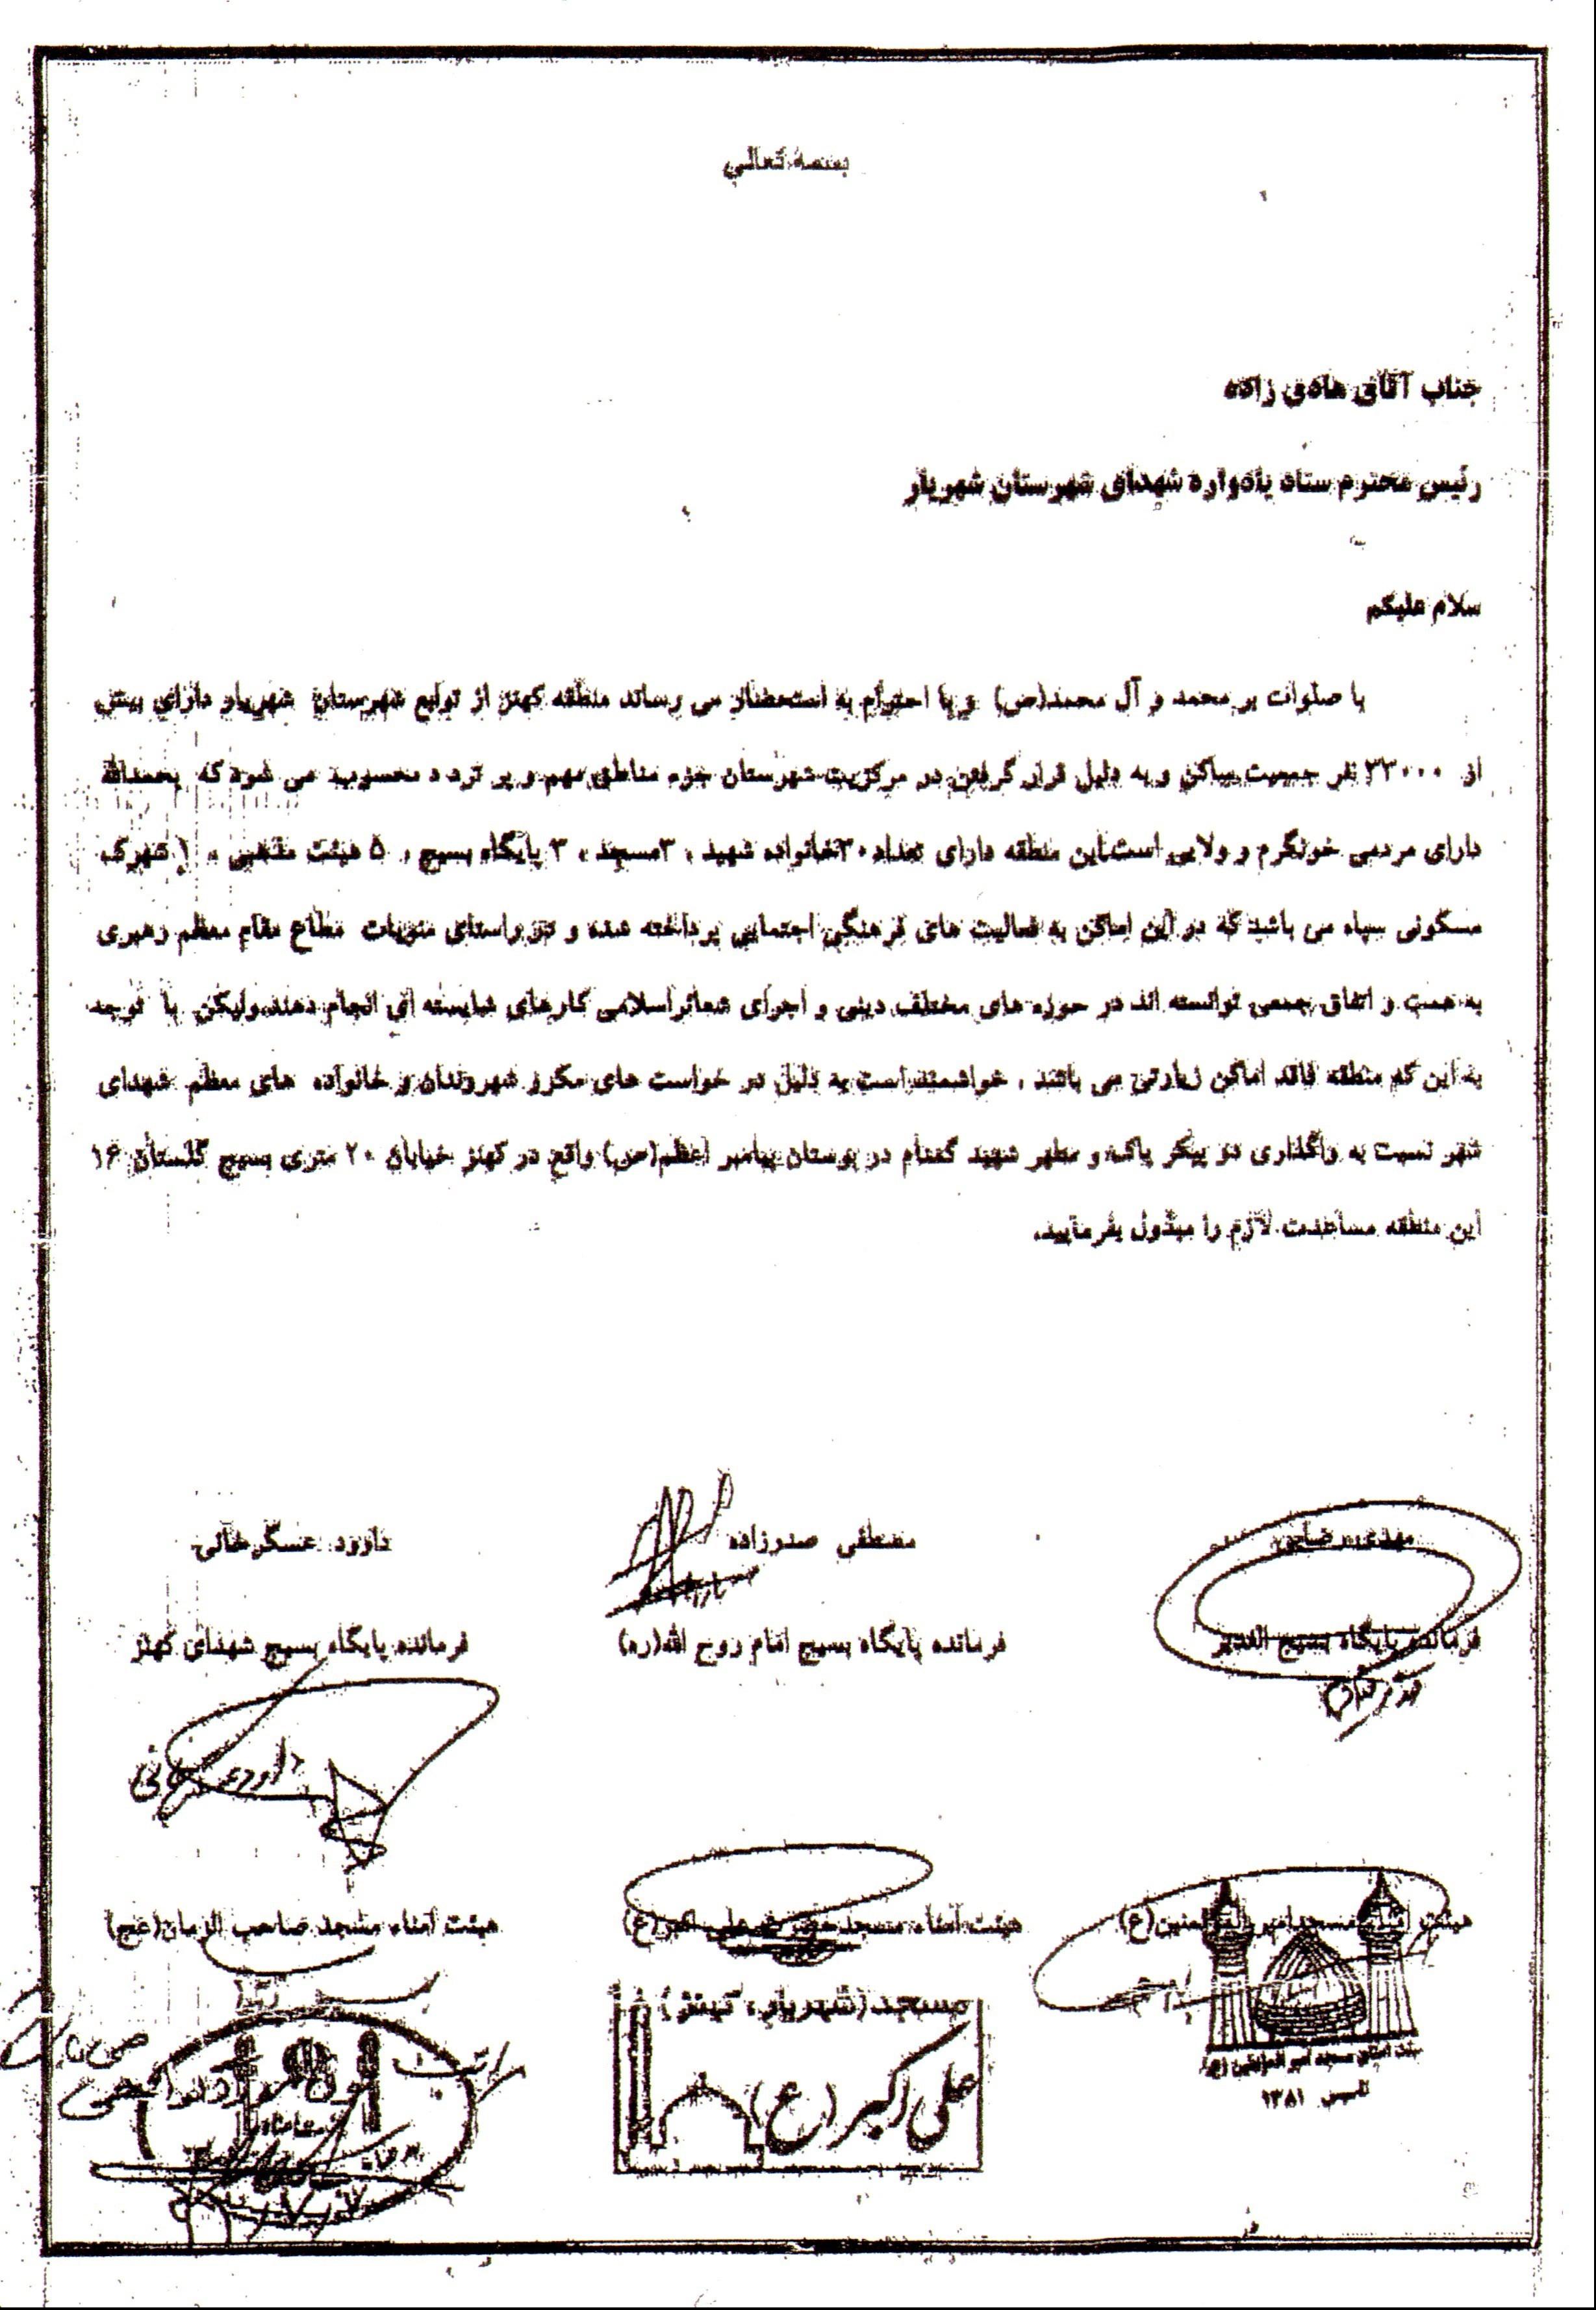 کانال+تلگرام+سپاه+فاطمیون